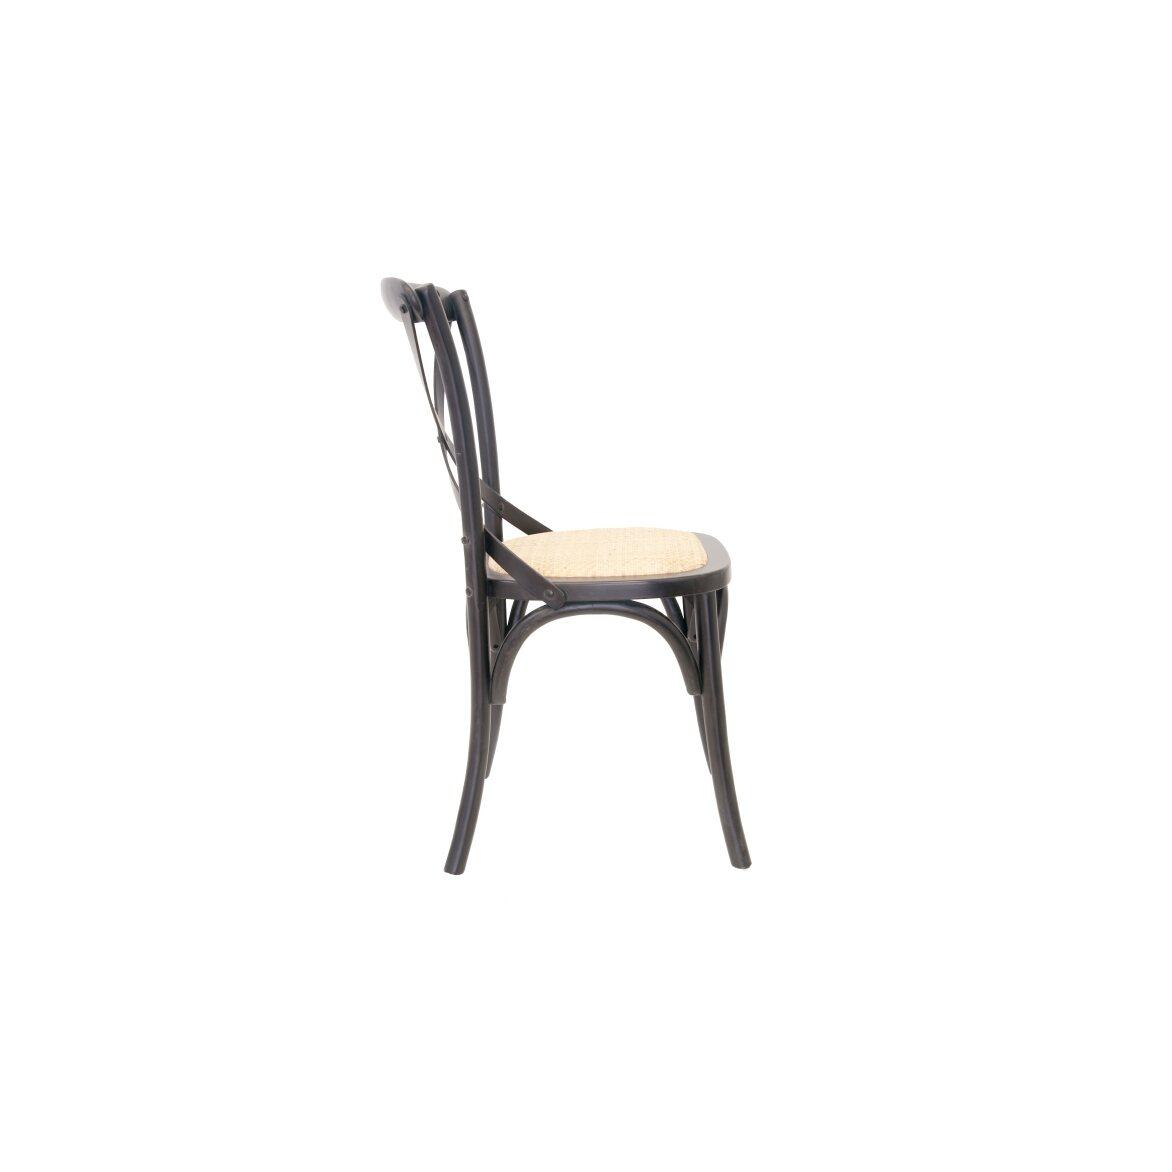 Стул Cross back black 2 | Обеденные стулья Kingsby